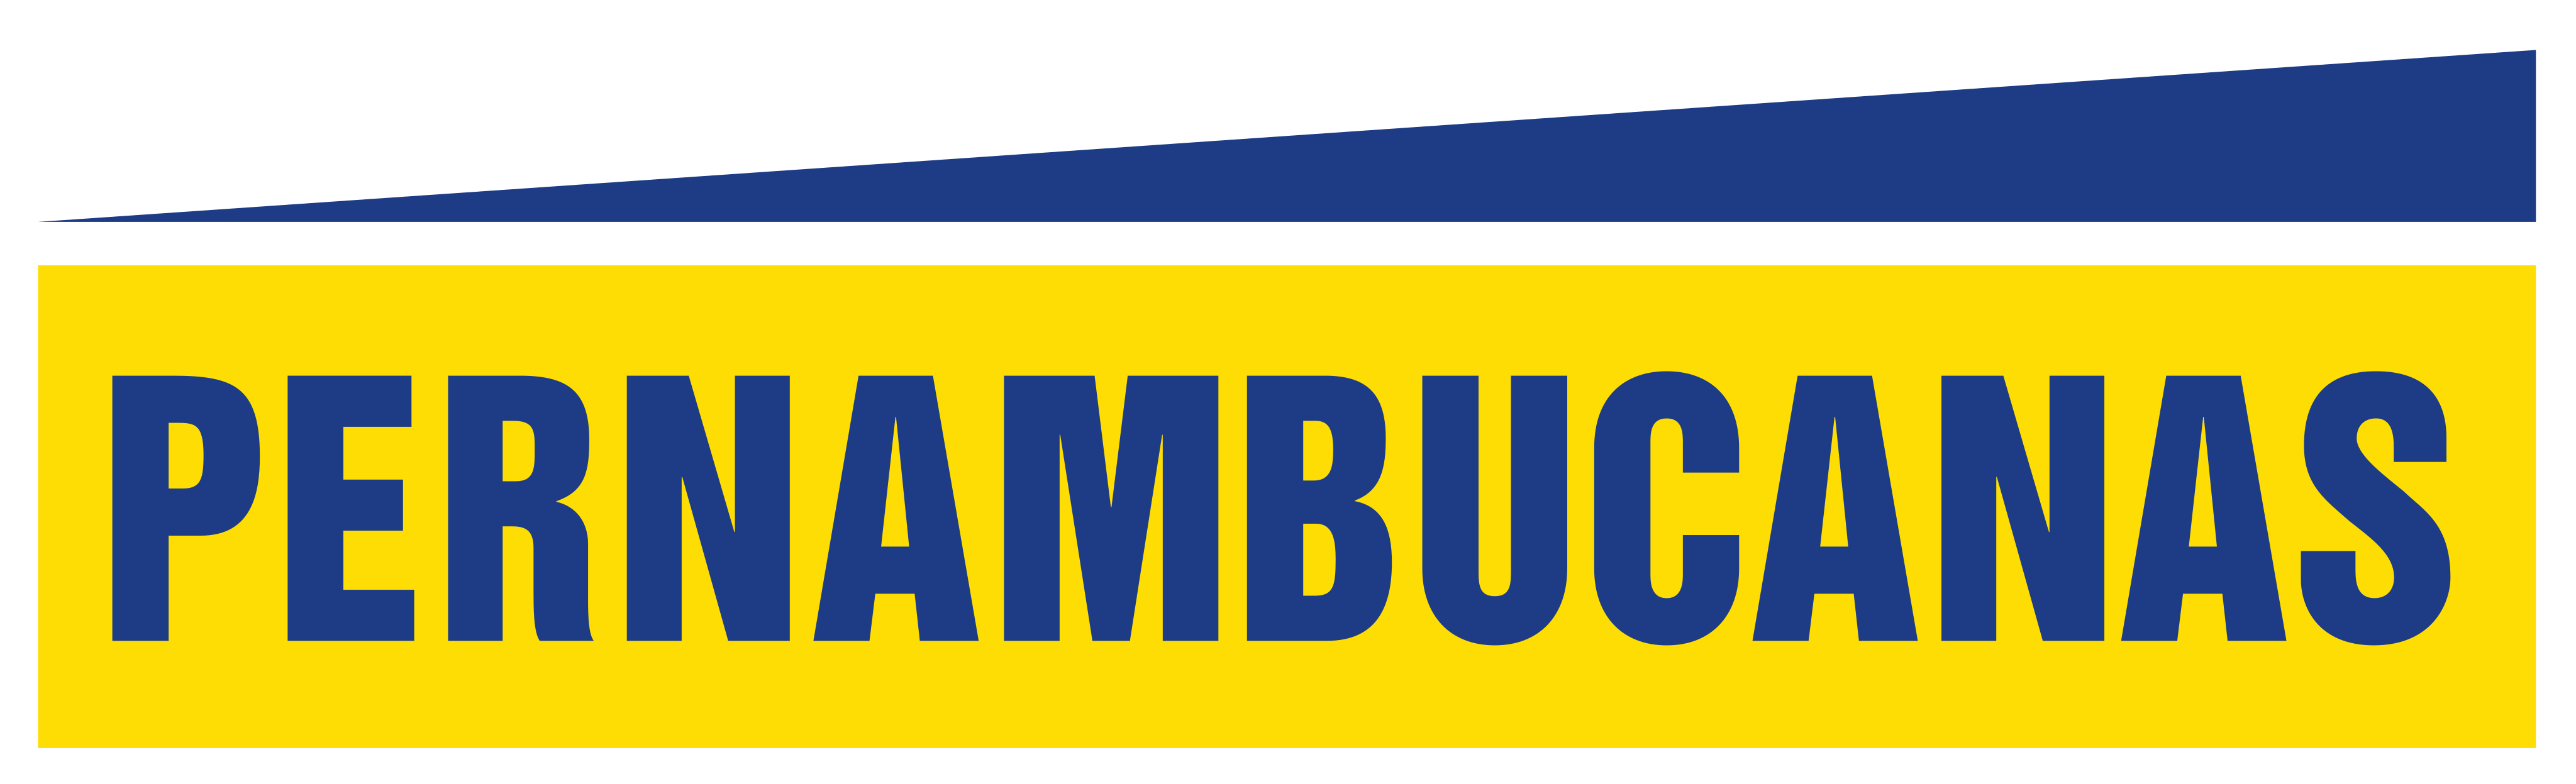 https://acessodigital.com/wp-content/uploads/2020/05/pernambucanas-logo.png